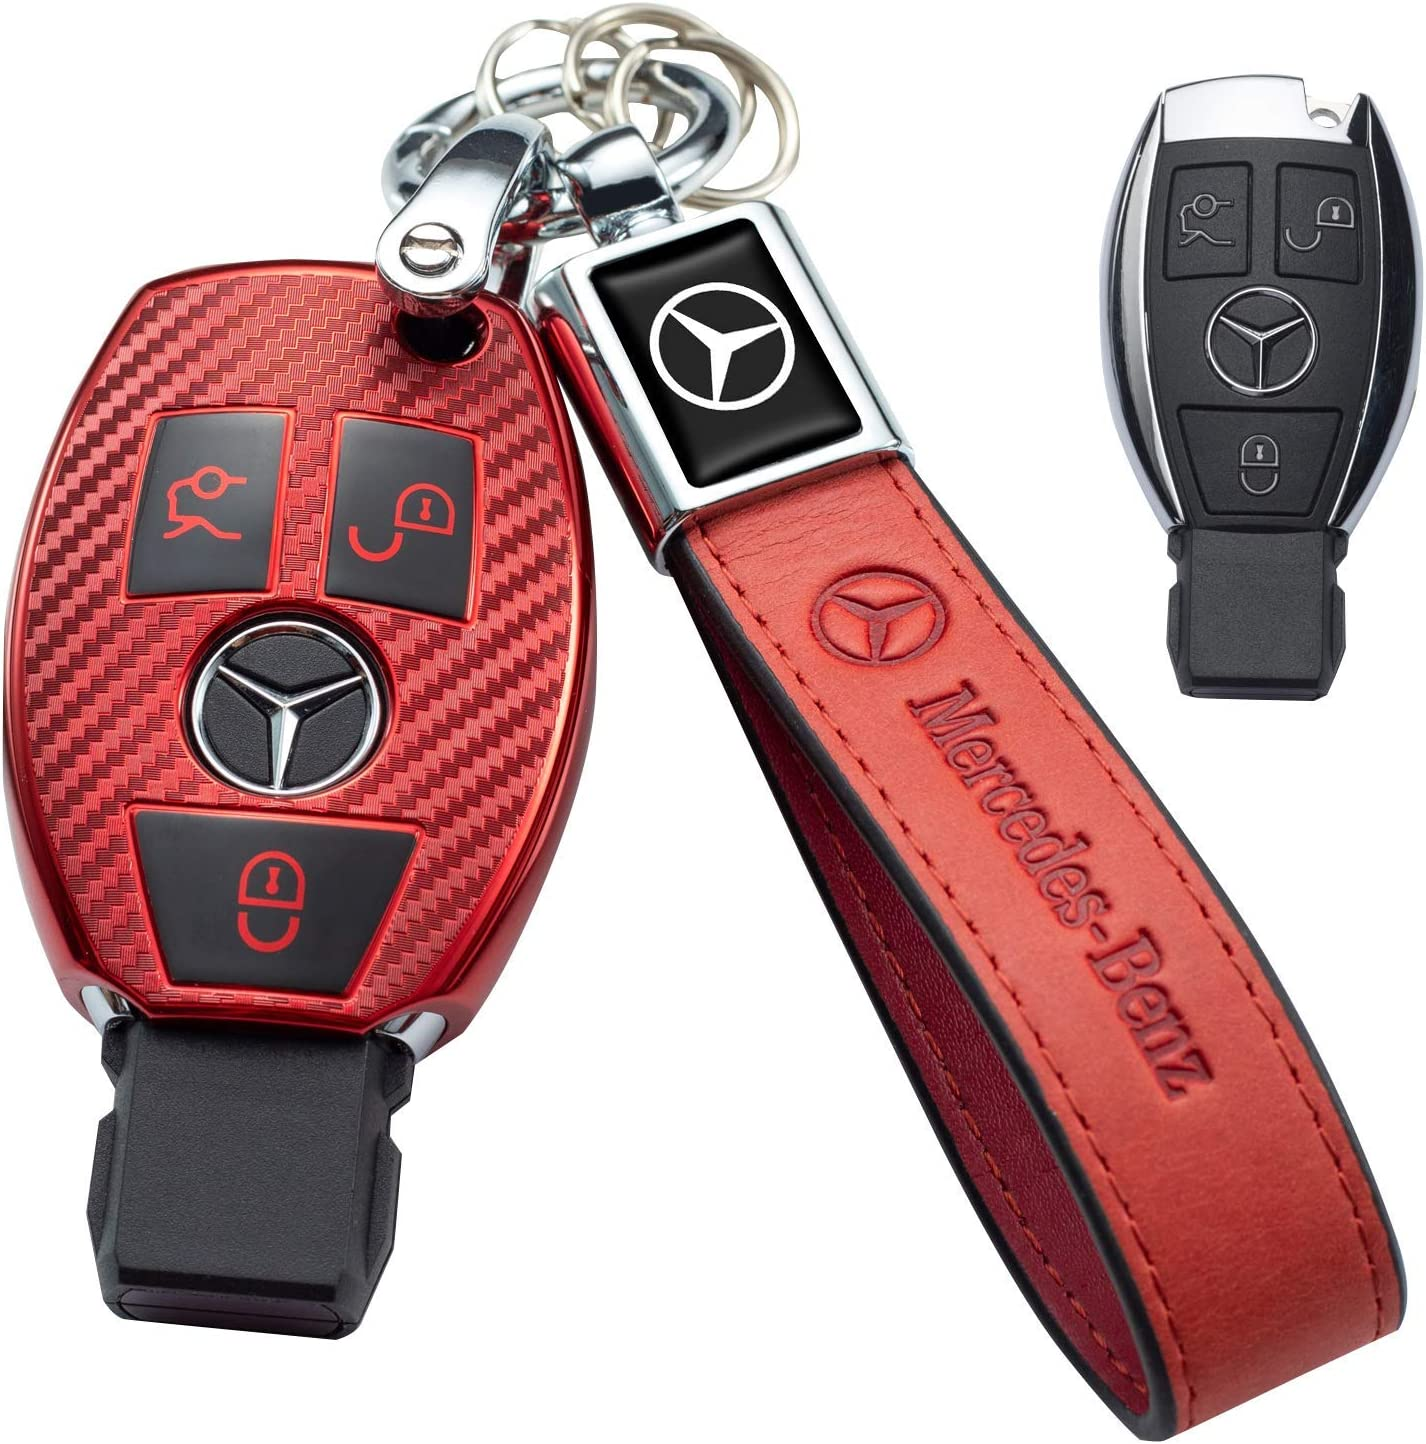 for Mercedes Benz Key Fob Cover Premium Soft TPU Key Case Cover Carbon fiber Compatible with Mercedes Benz C E S M CLS CLK G Class logo Smart Key case Fob red